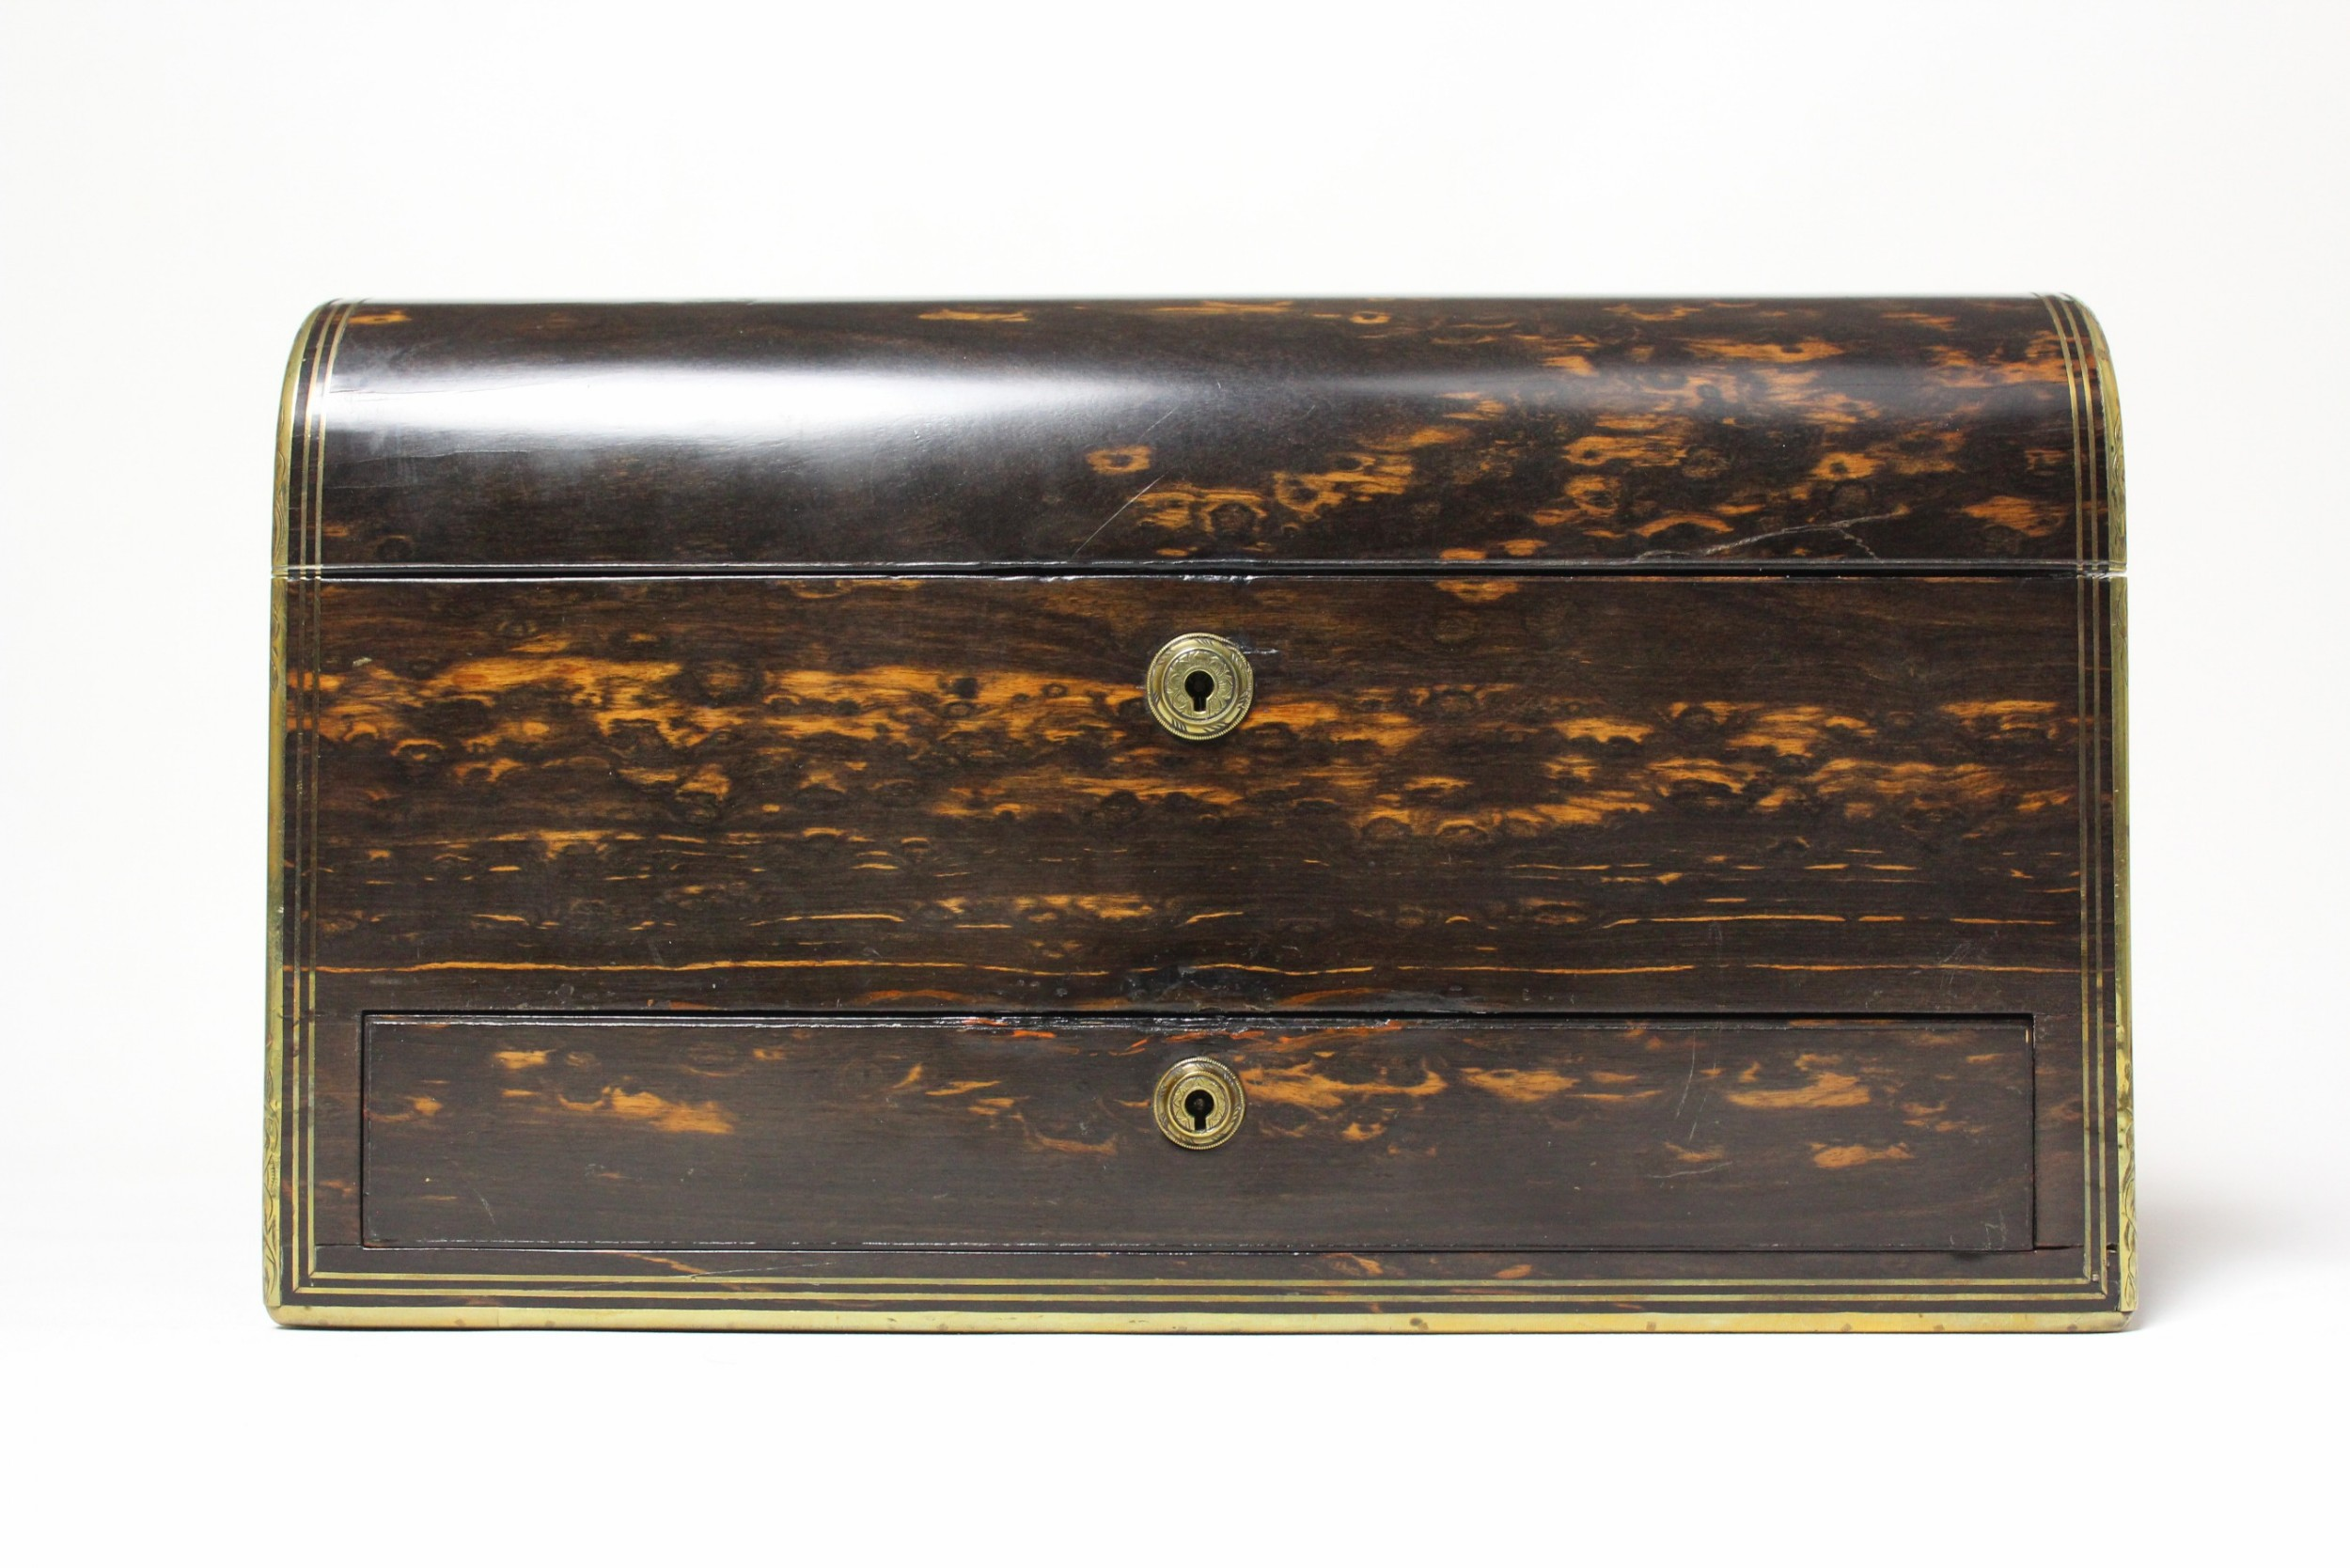 19th century coromandel box